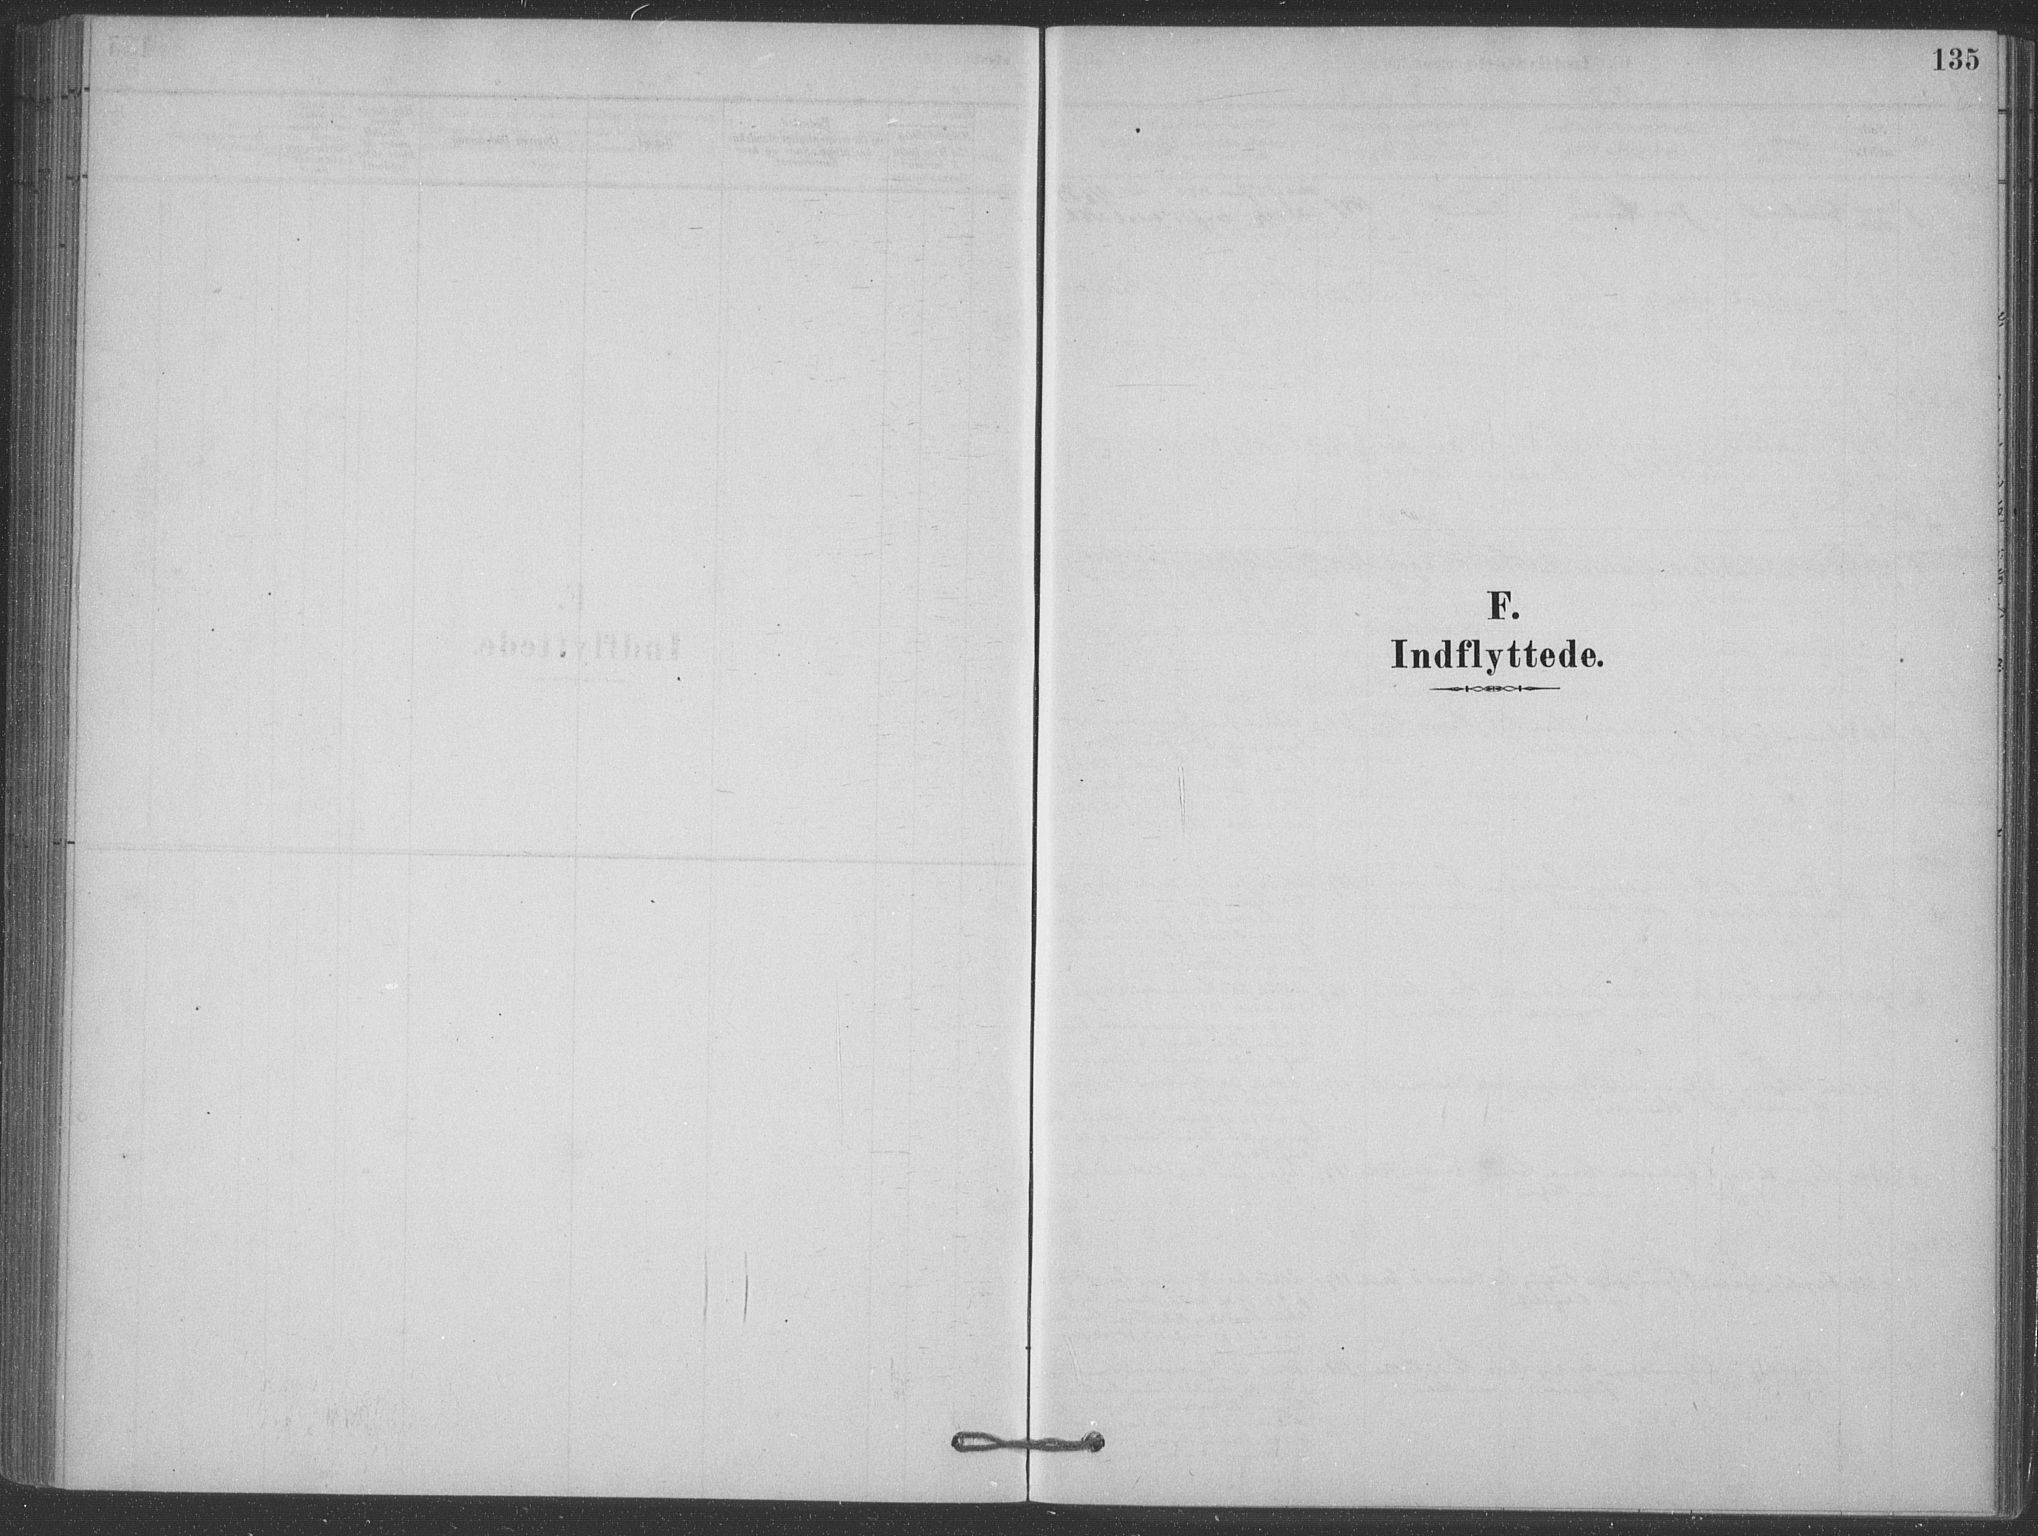 SAKO, Heddal kirkebøker, F/Fb/L0002: Ministerialbok nr. II 2, 1878-1913, s. 135